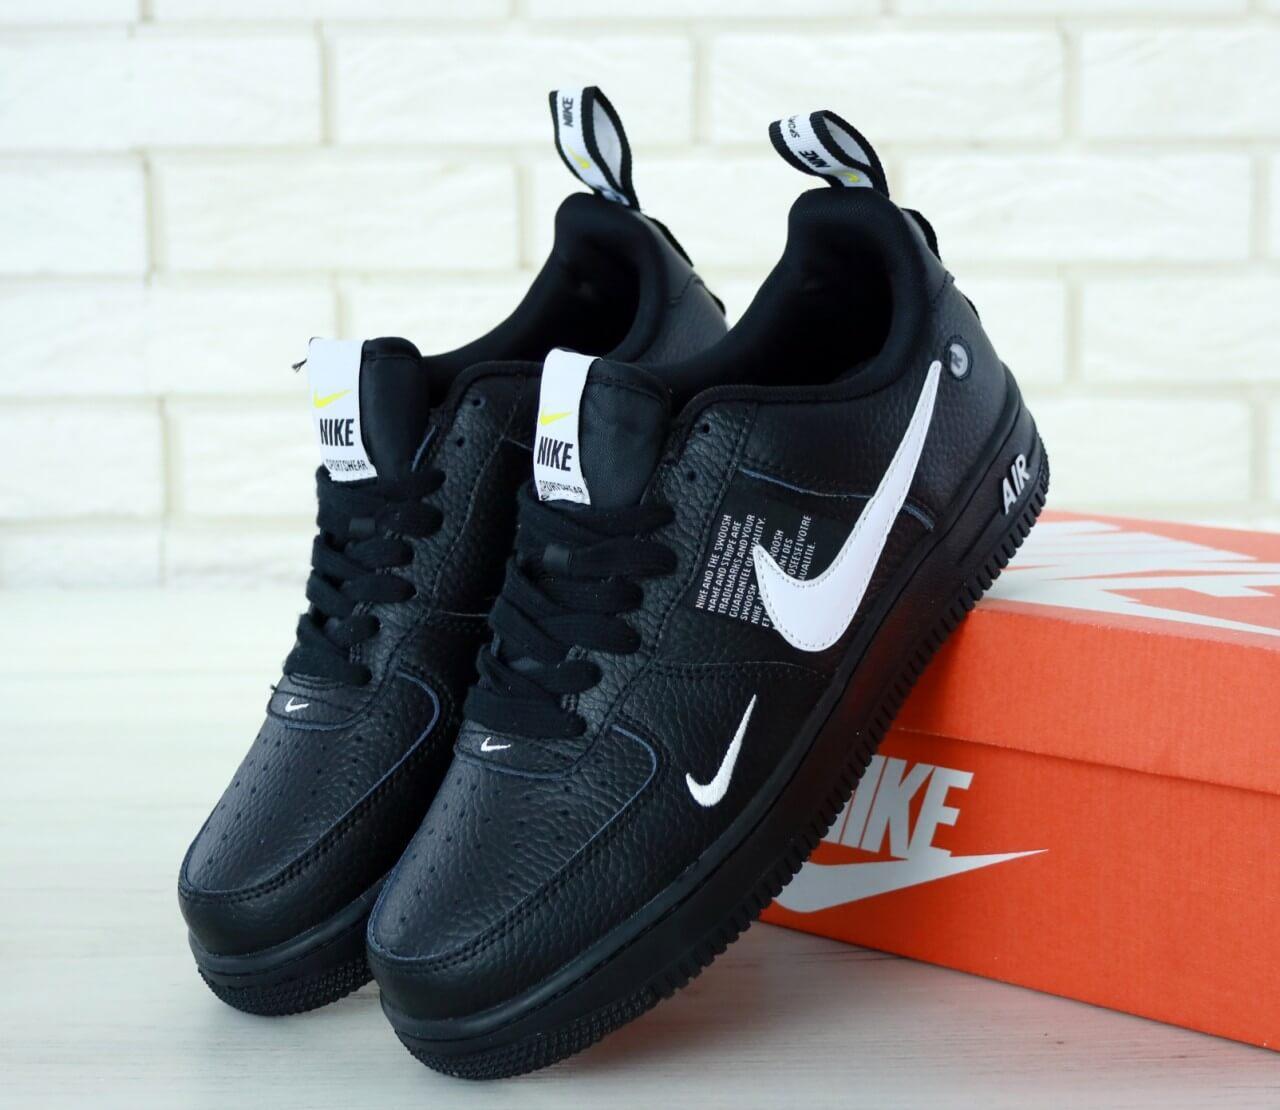 11594e63 Кроссовки Nike Air Force 1 Low TM 07 Black купить в Киеве   Im-PoLLi ...